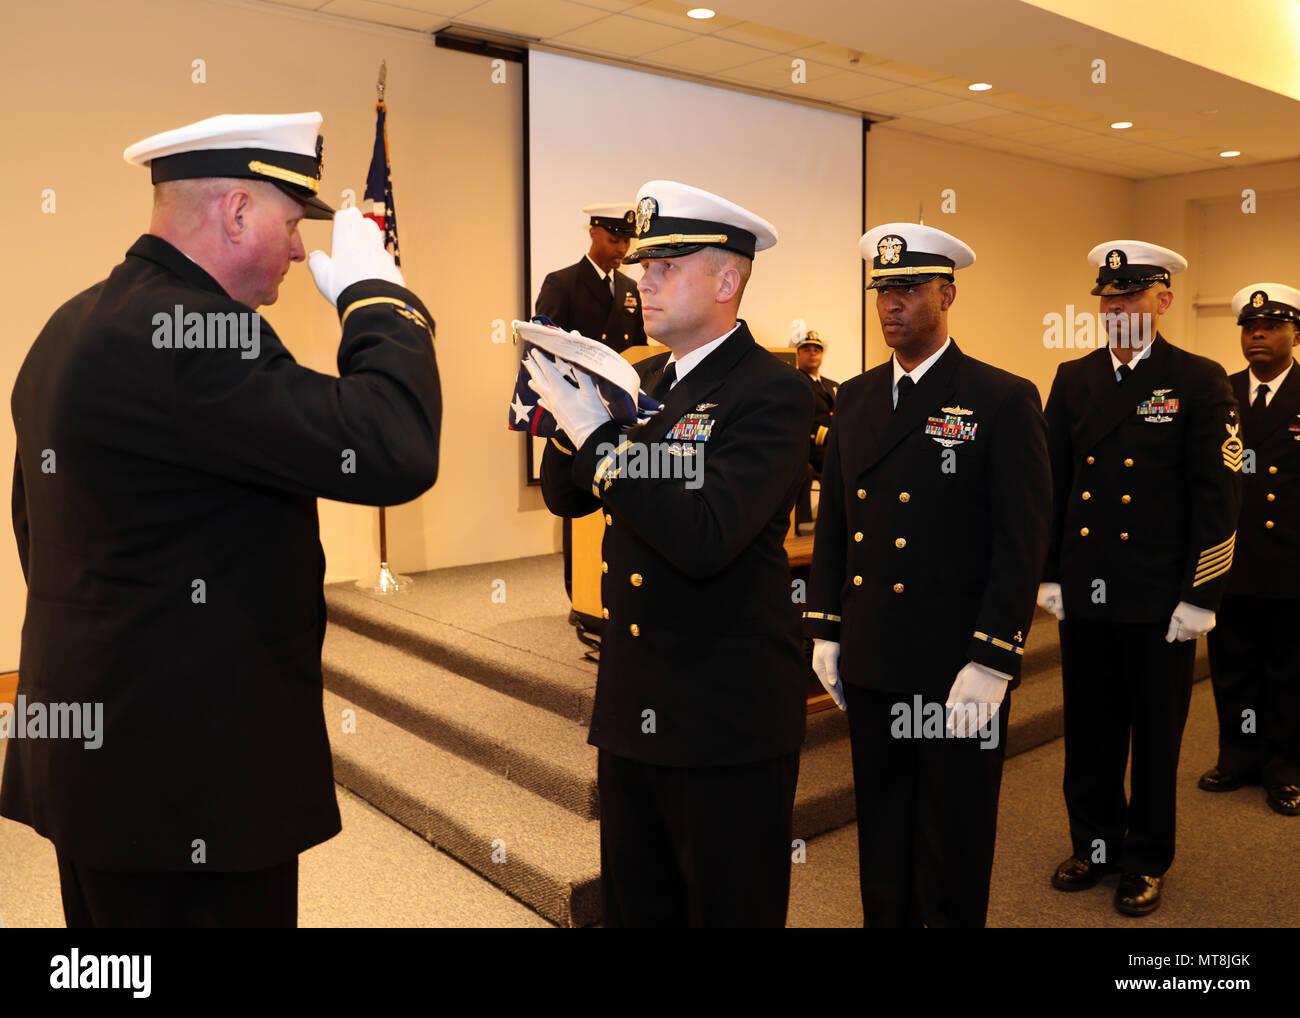 U S Navy Chief Warrant Officer Stock Photos & U S Navy Chief